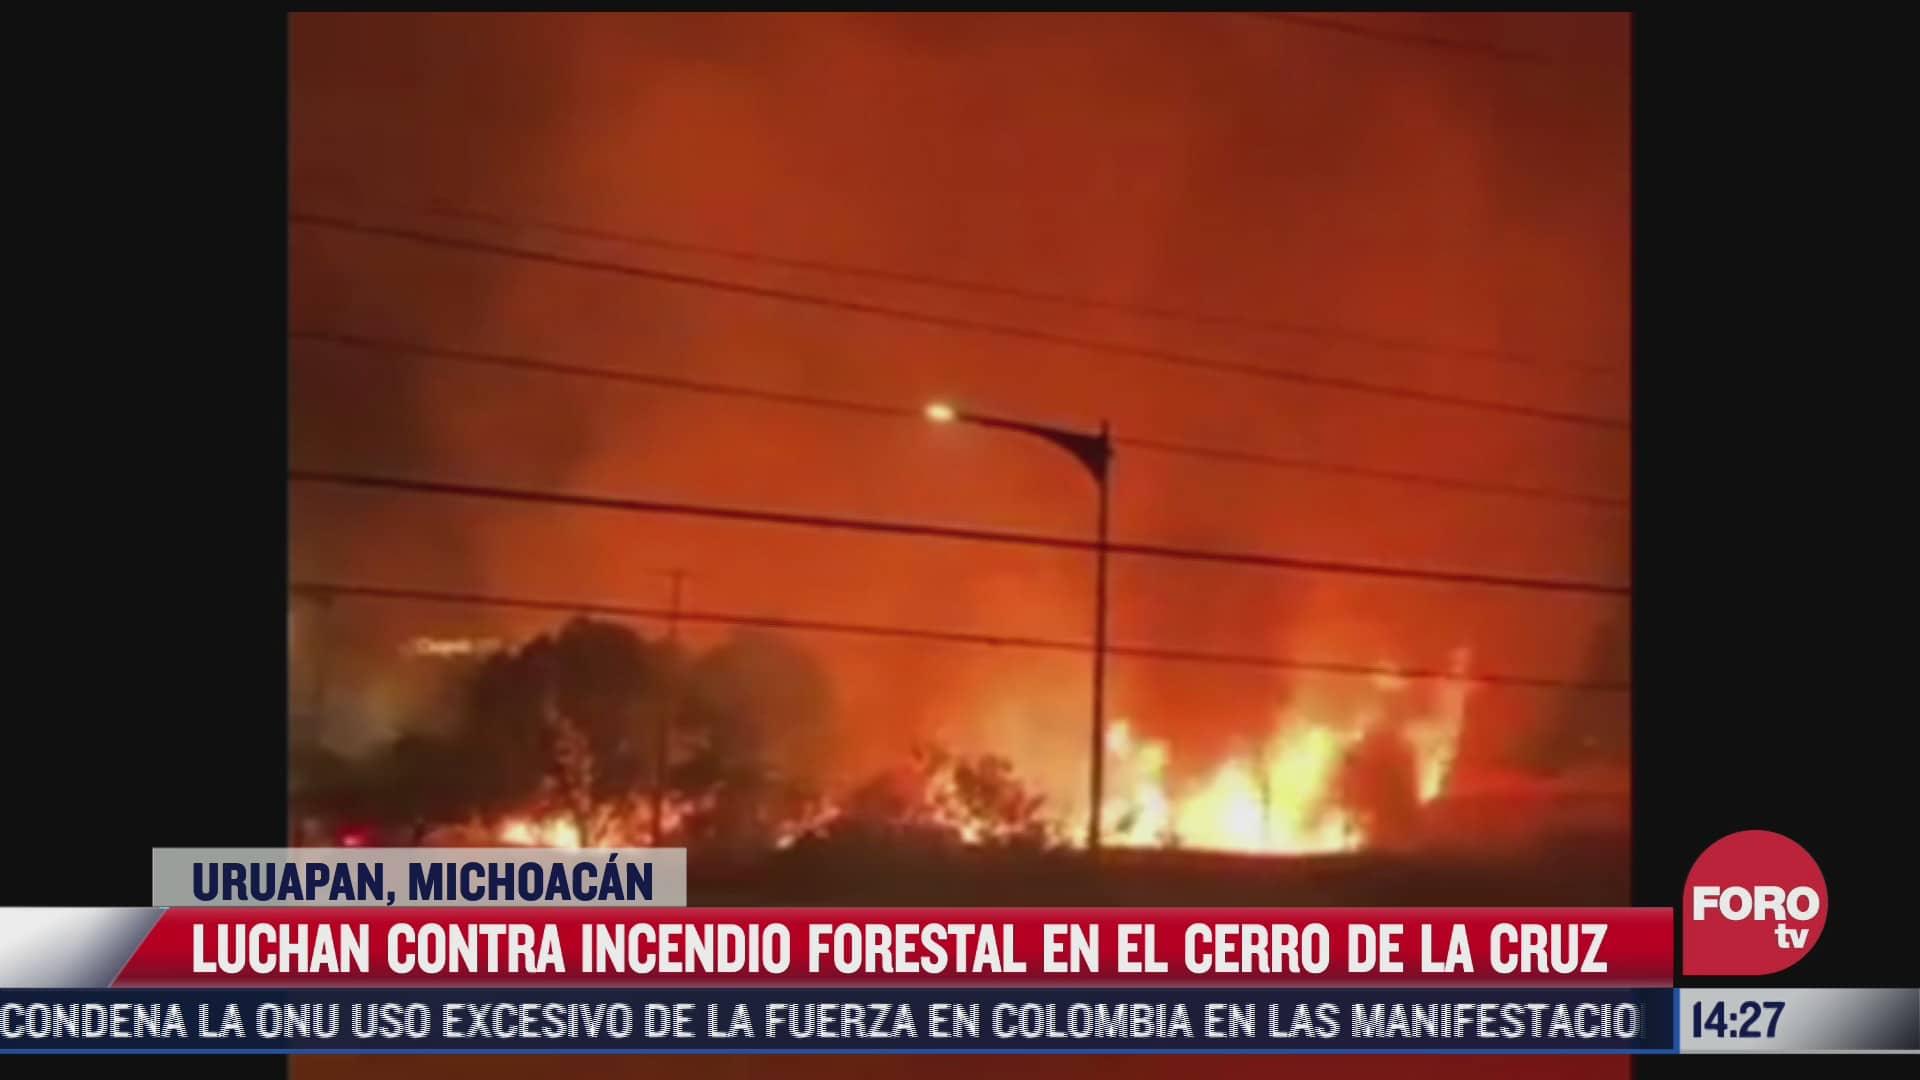 se incendia el cerro de la cruz de uruapan